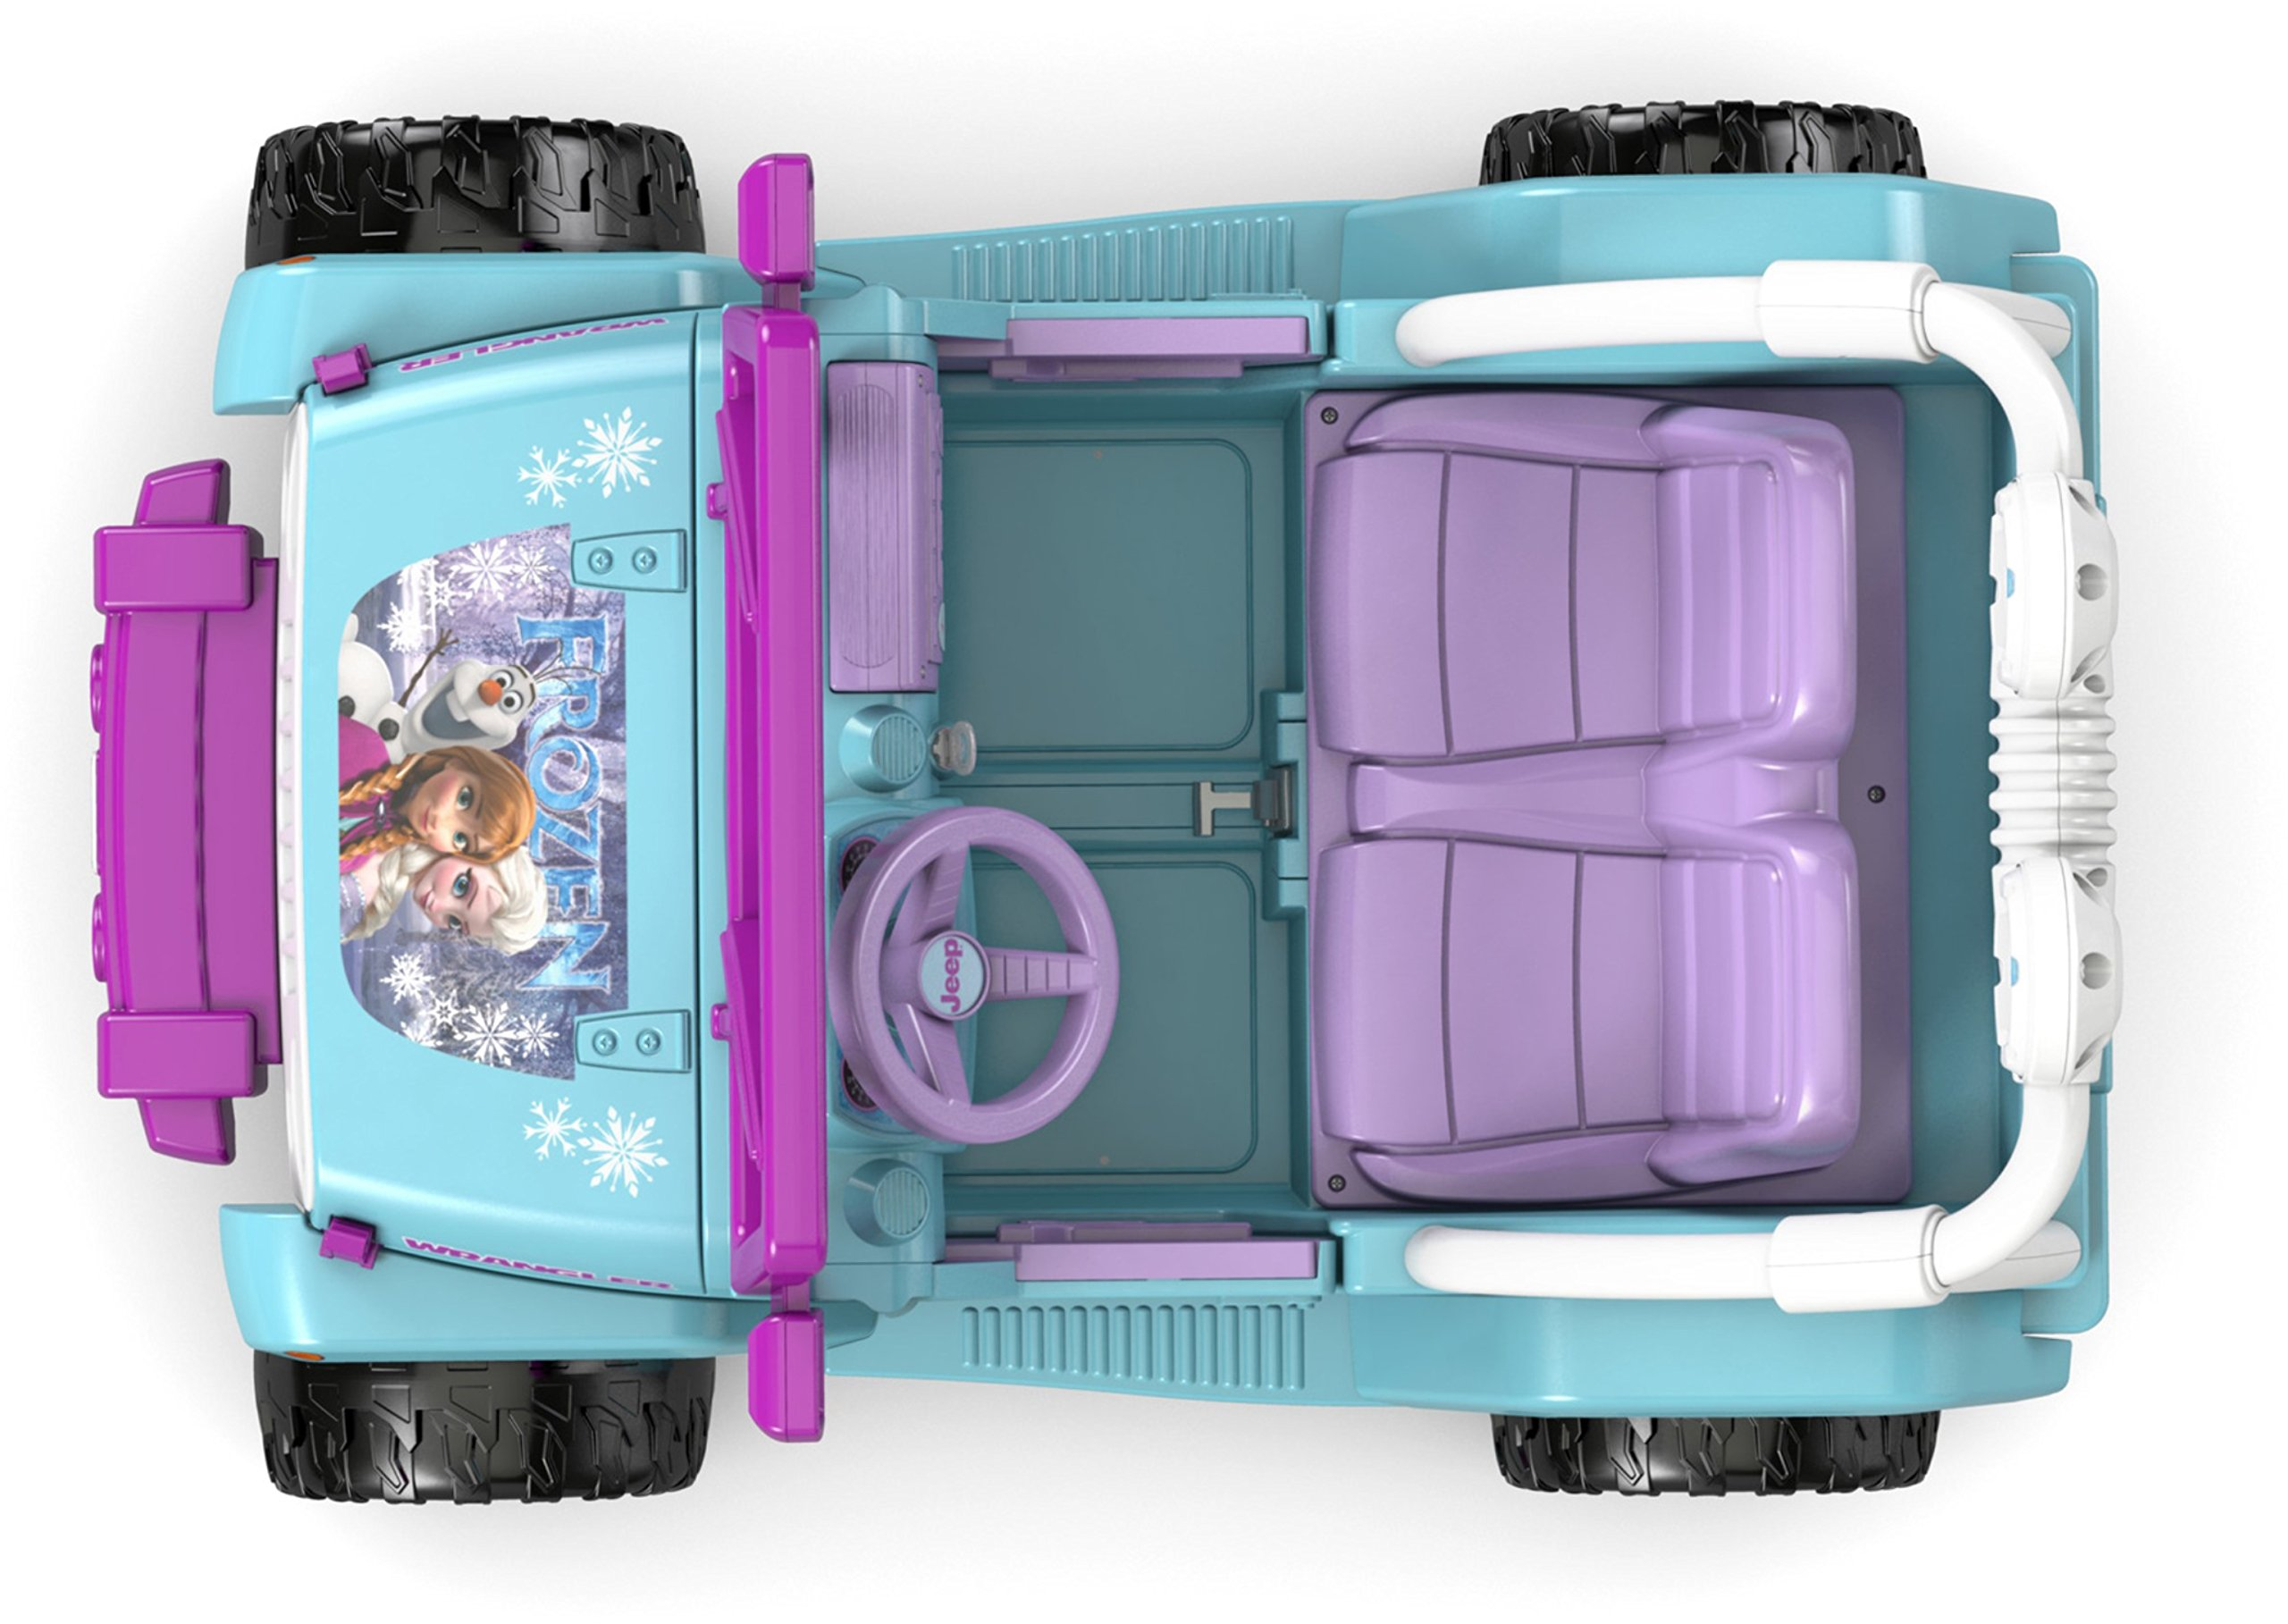 Power Wheels Disney Frozen Jeep Wrangler by Fisher-Price (Image #10)